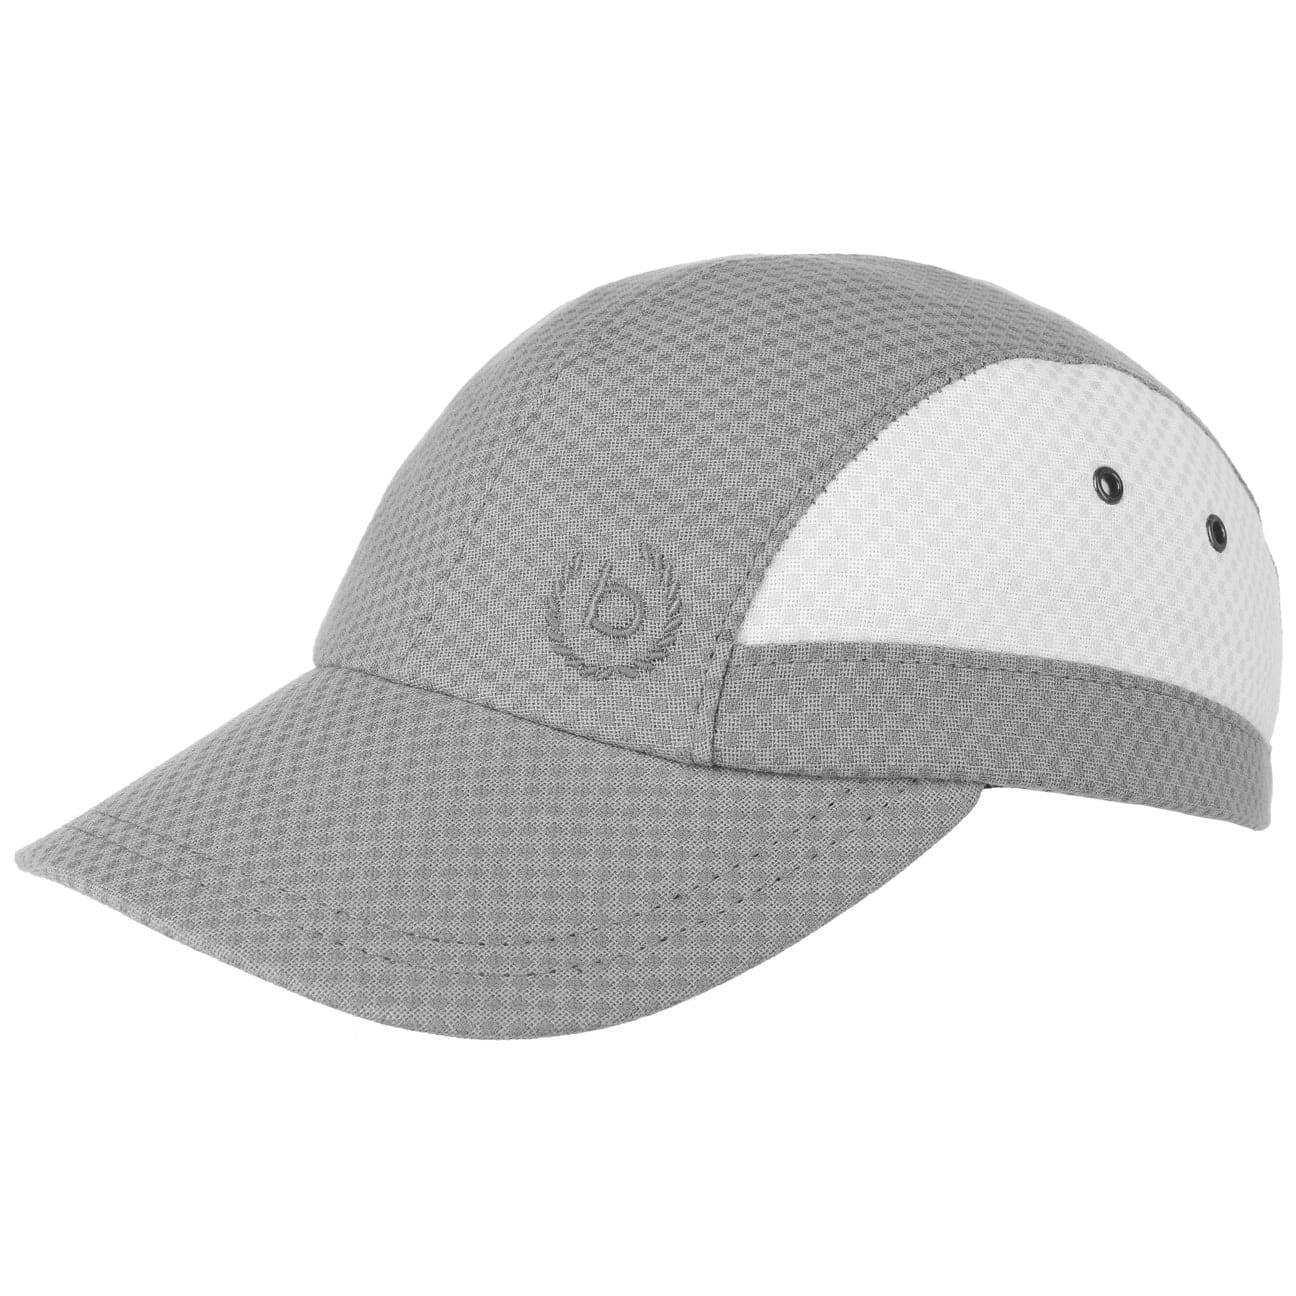 Gorra de B?isbol Larsen Twotone by bugatti  gorra de algod?n